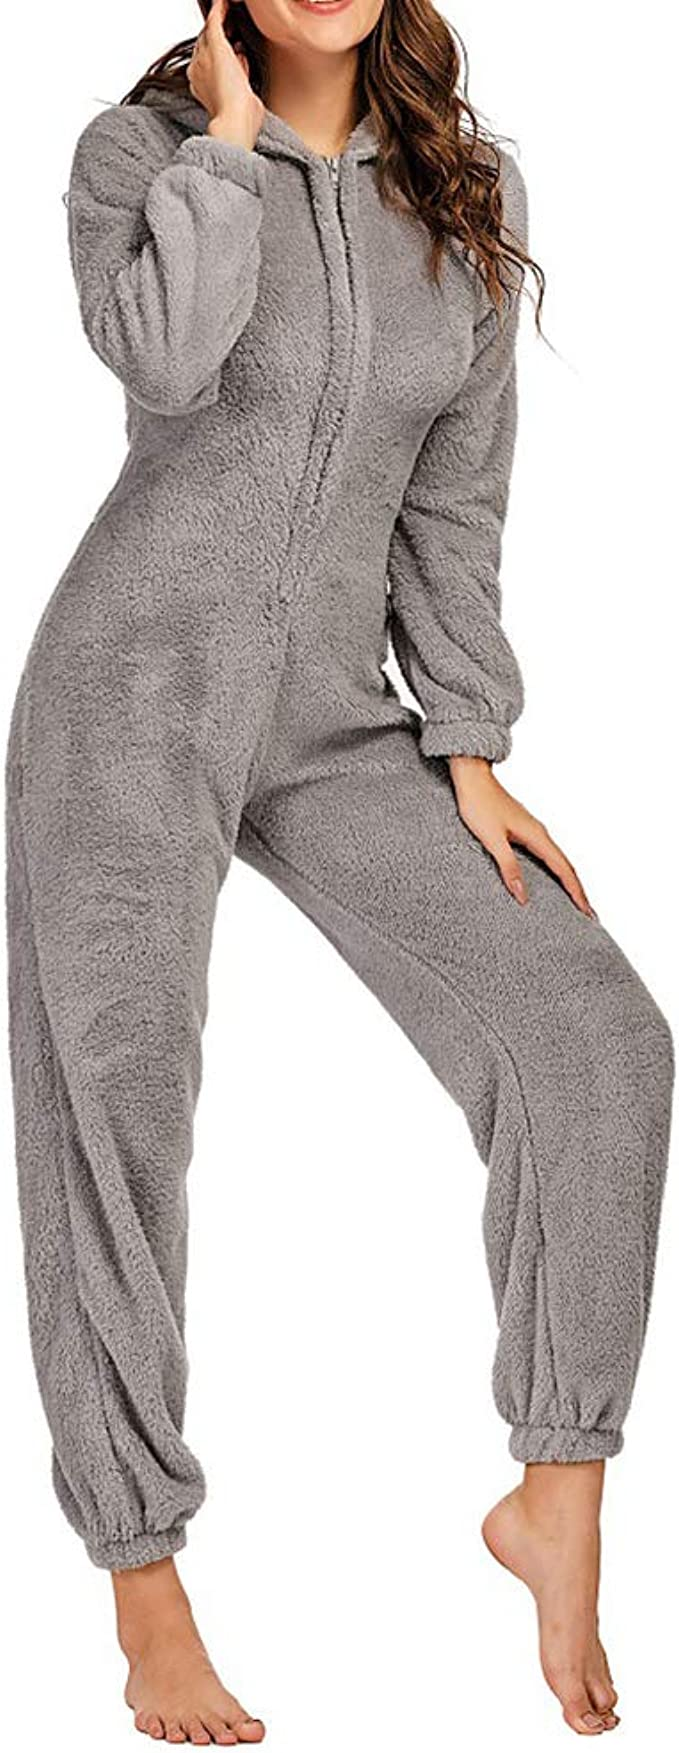 Mono Pijama De Mujer Niño Pijama Invierno Capucha 3D Adulto ...